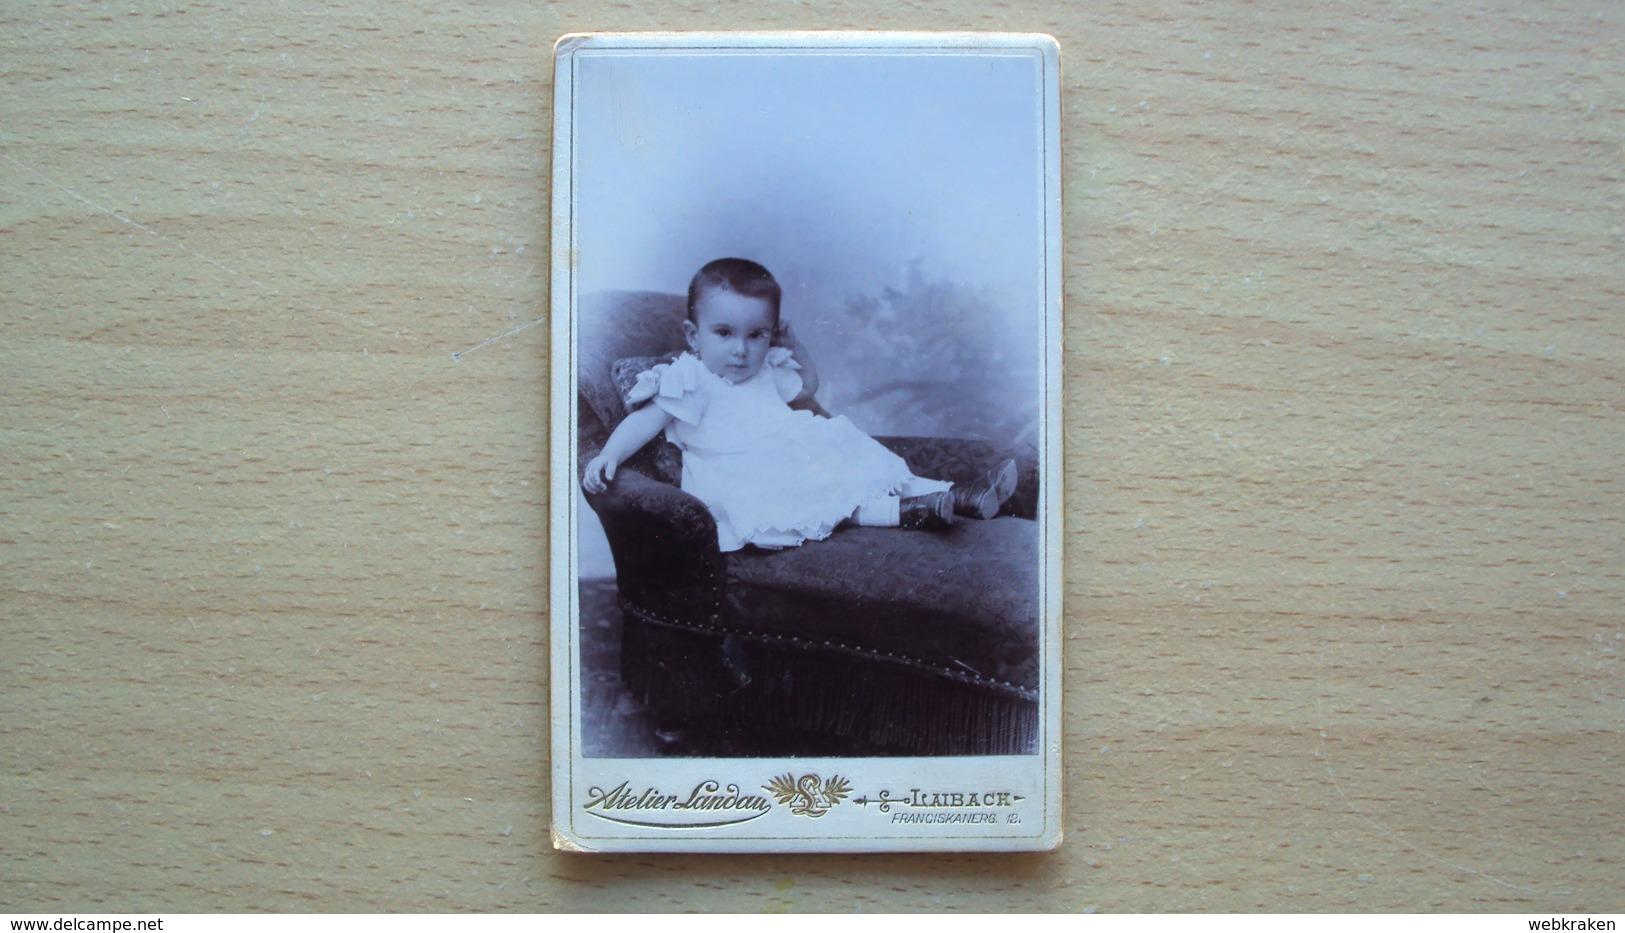 SLOVENIA LUBIANA FOTO CARTONATA ORIGINALE D'EPOCA BIMBO IN POSA FOTOGRAFO LANDAU LAIBACH LJUBLJANA - Altri